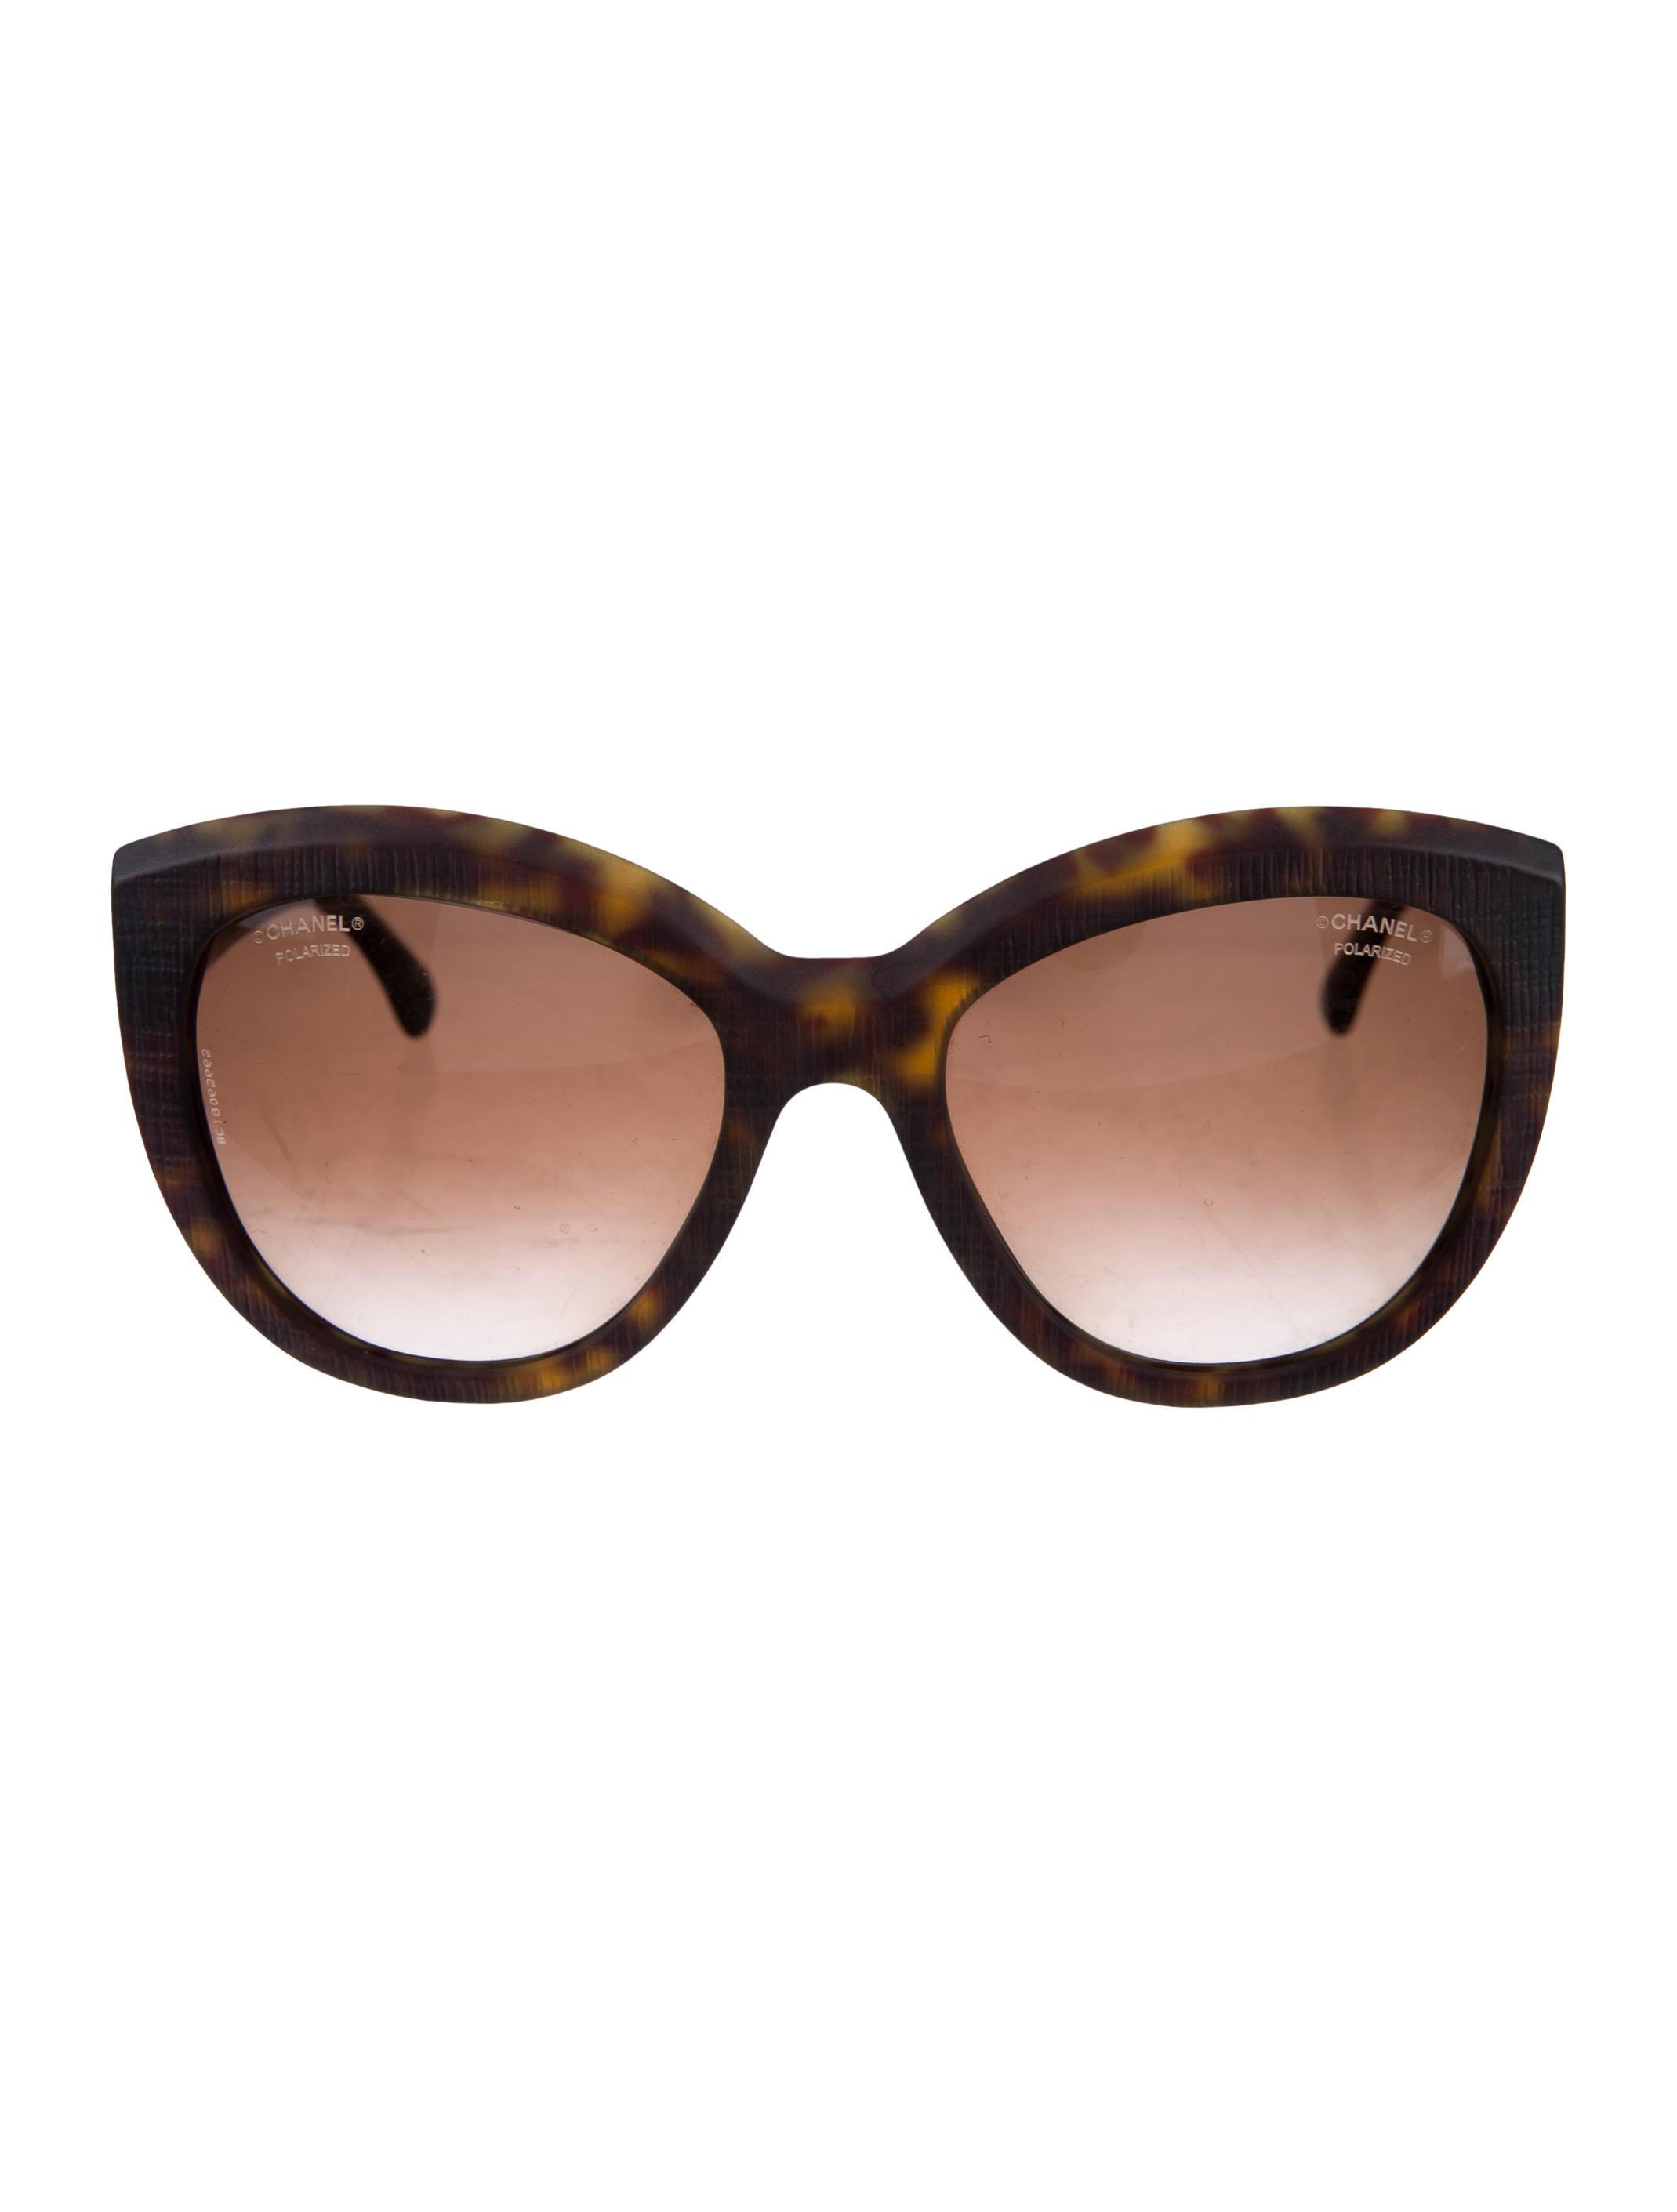 b7dd4c02f4 Chanel Butterfly Signature Sunglasses - Accessories - CHA227972 ...